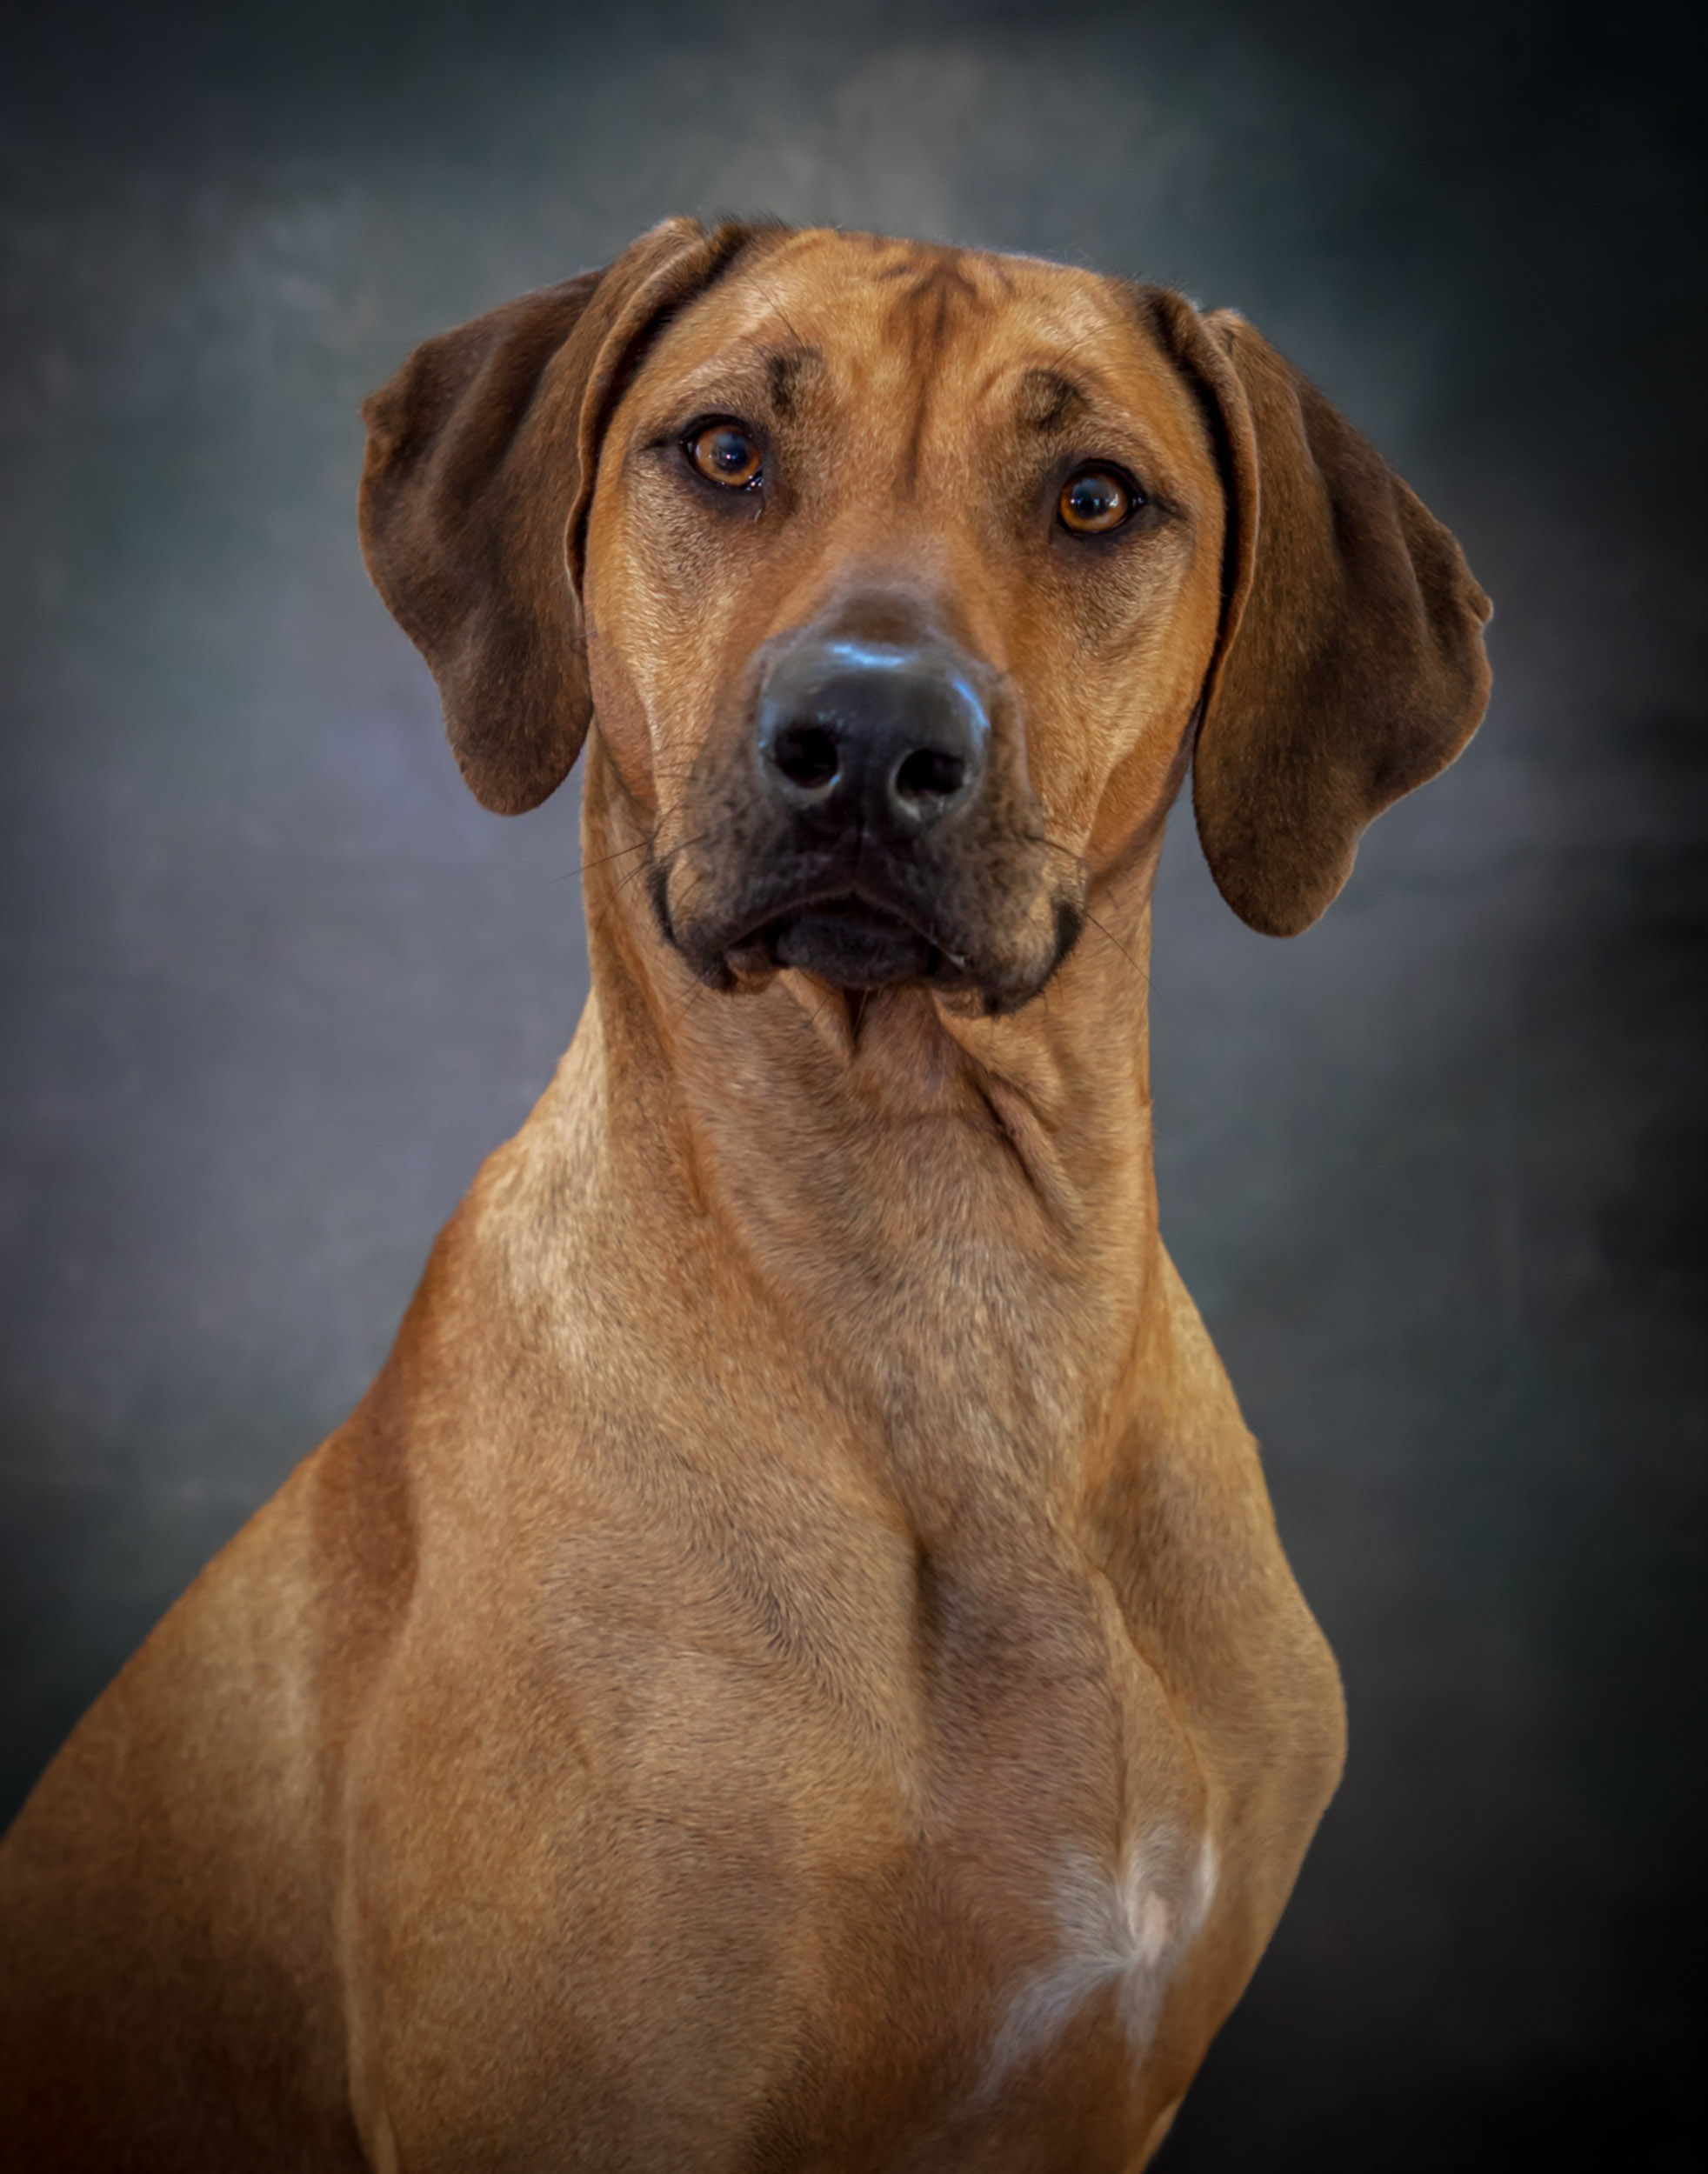 Rhodesian Ridgeback Dog Pet Photography Portrait